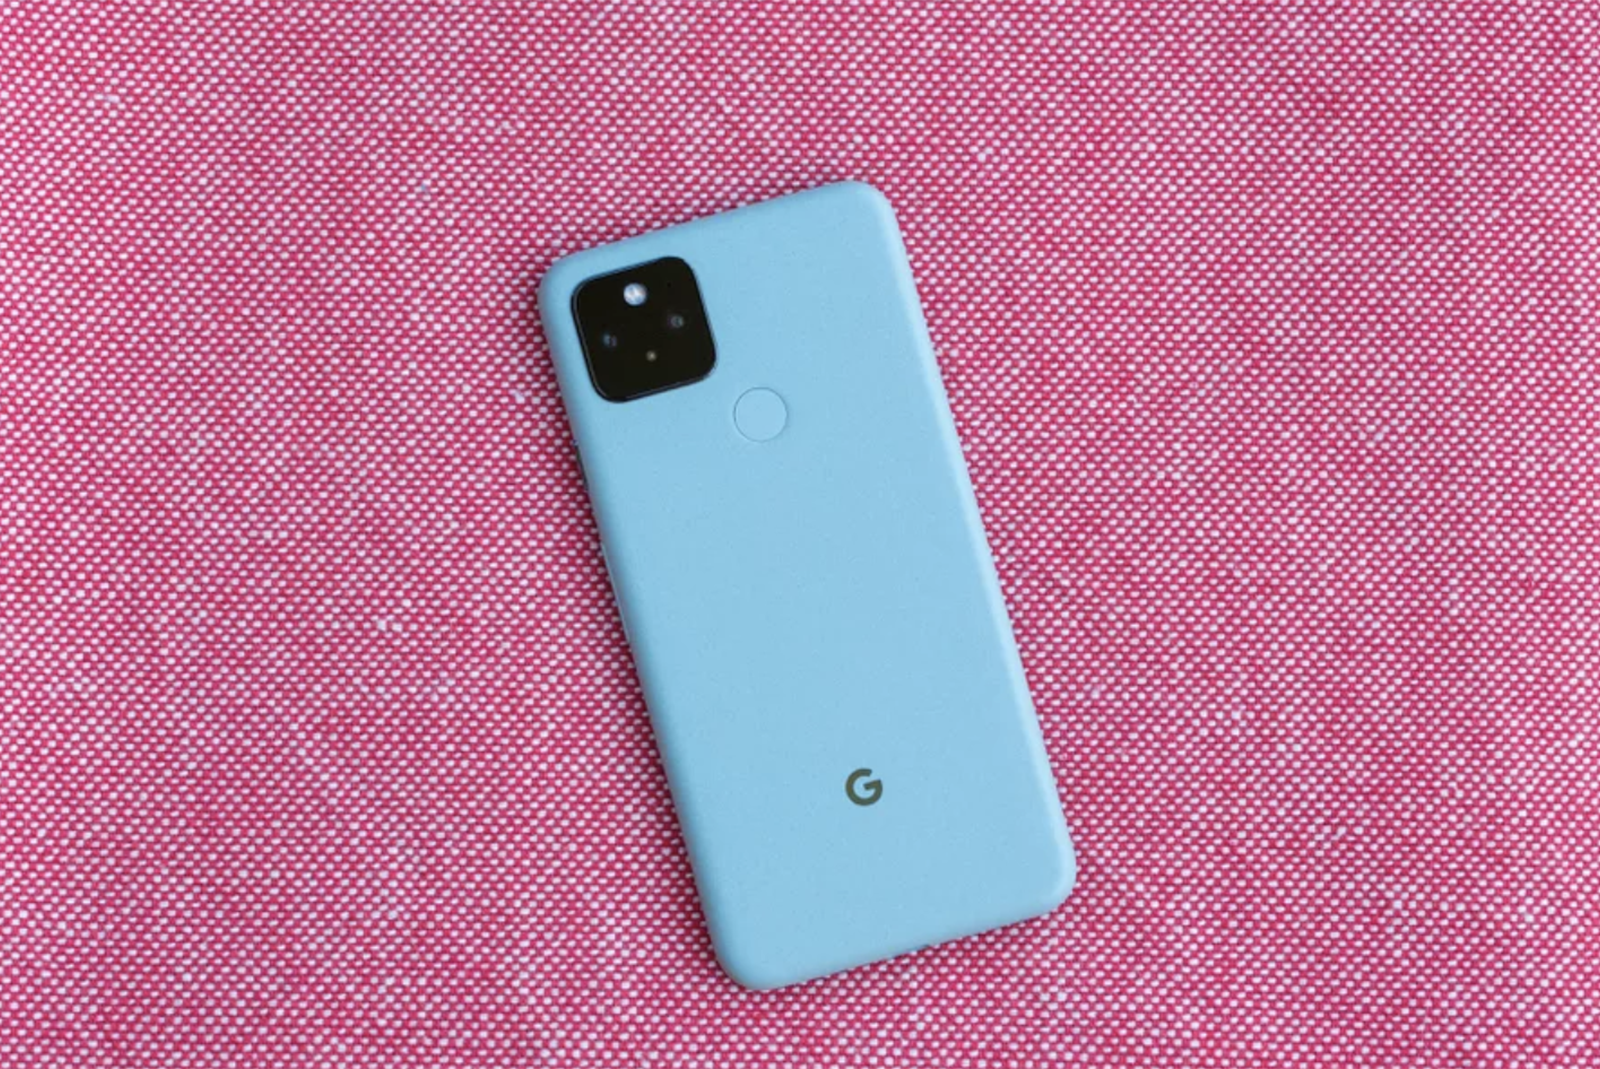 google-pixel-5-review-colors-best-phones.png